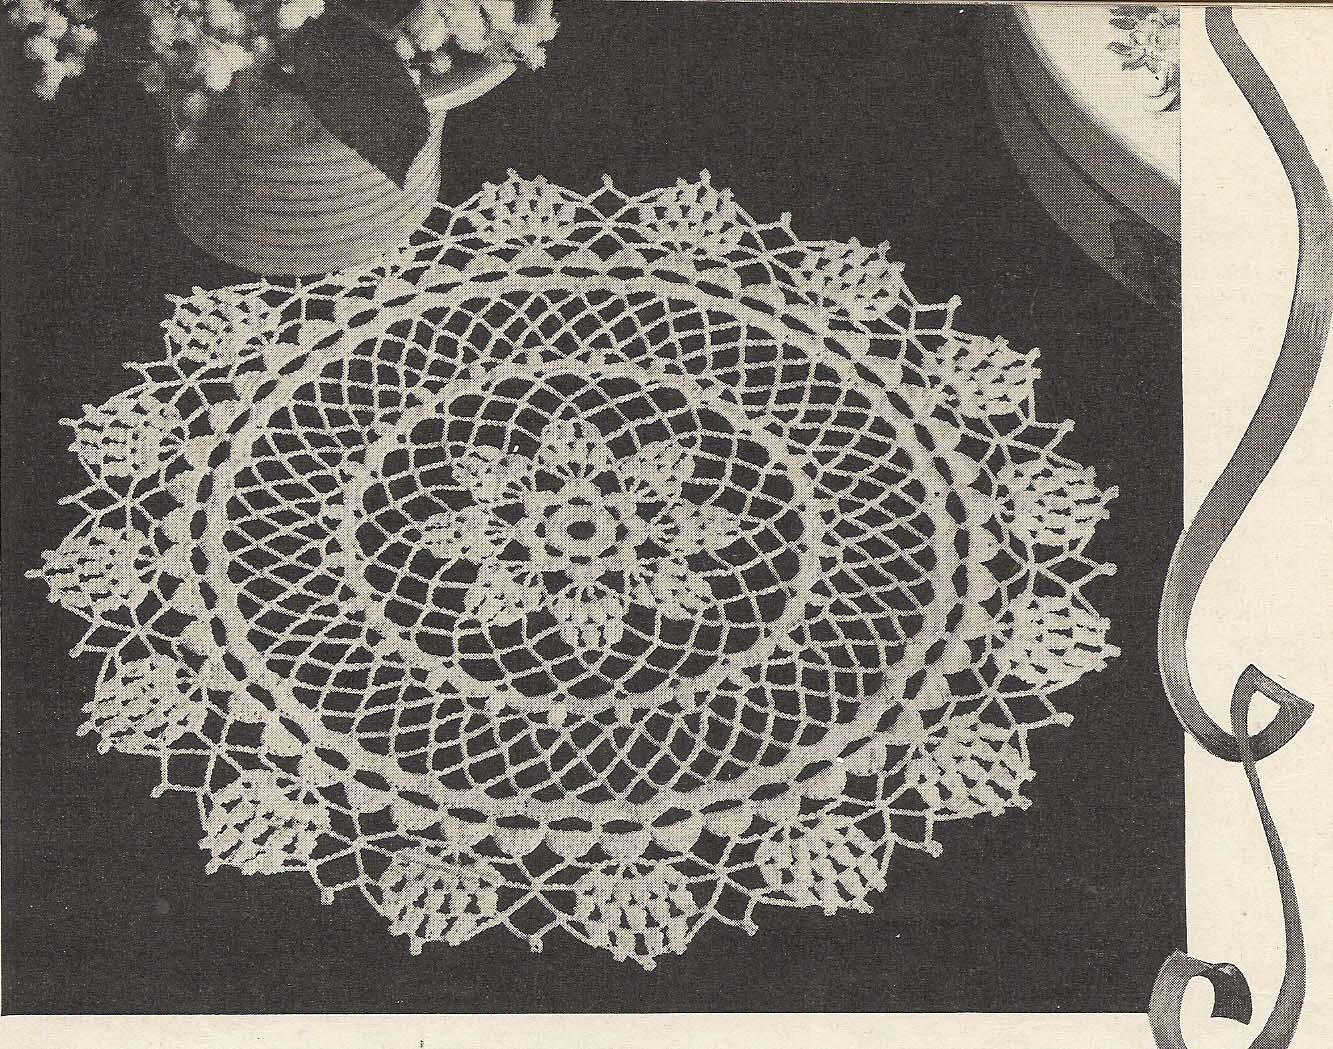 Free Crochet Star Doily Pattern : Vintage Knit Crochet Pattern Shop: Doilies Star Book 44 ...